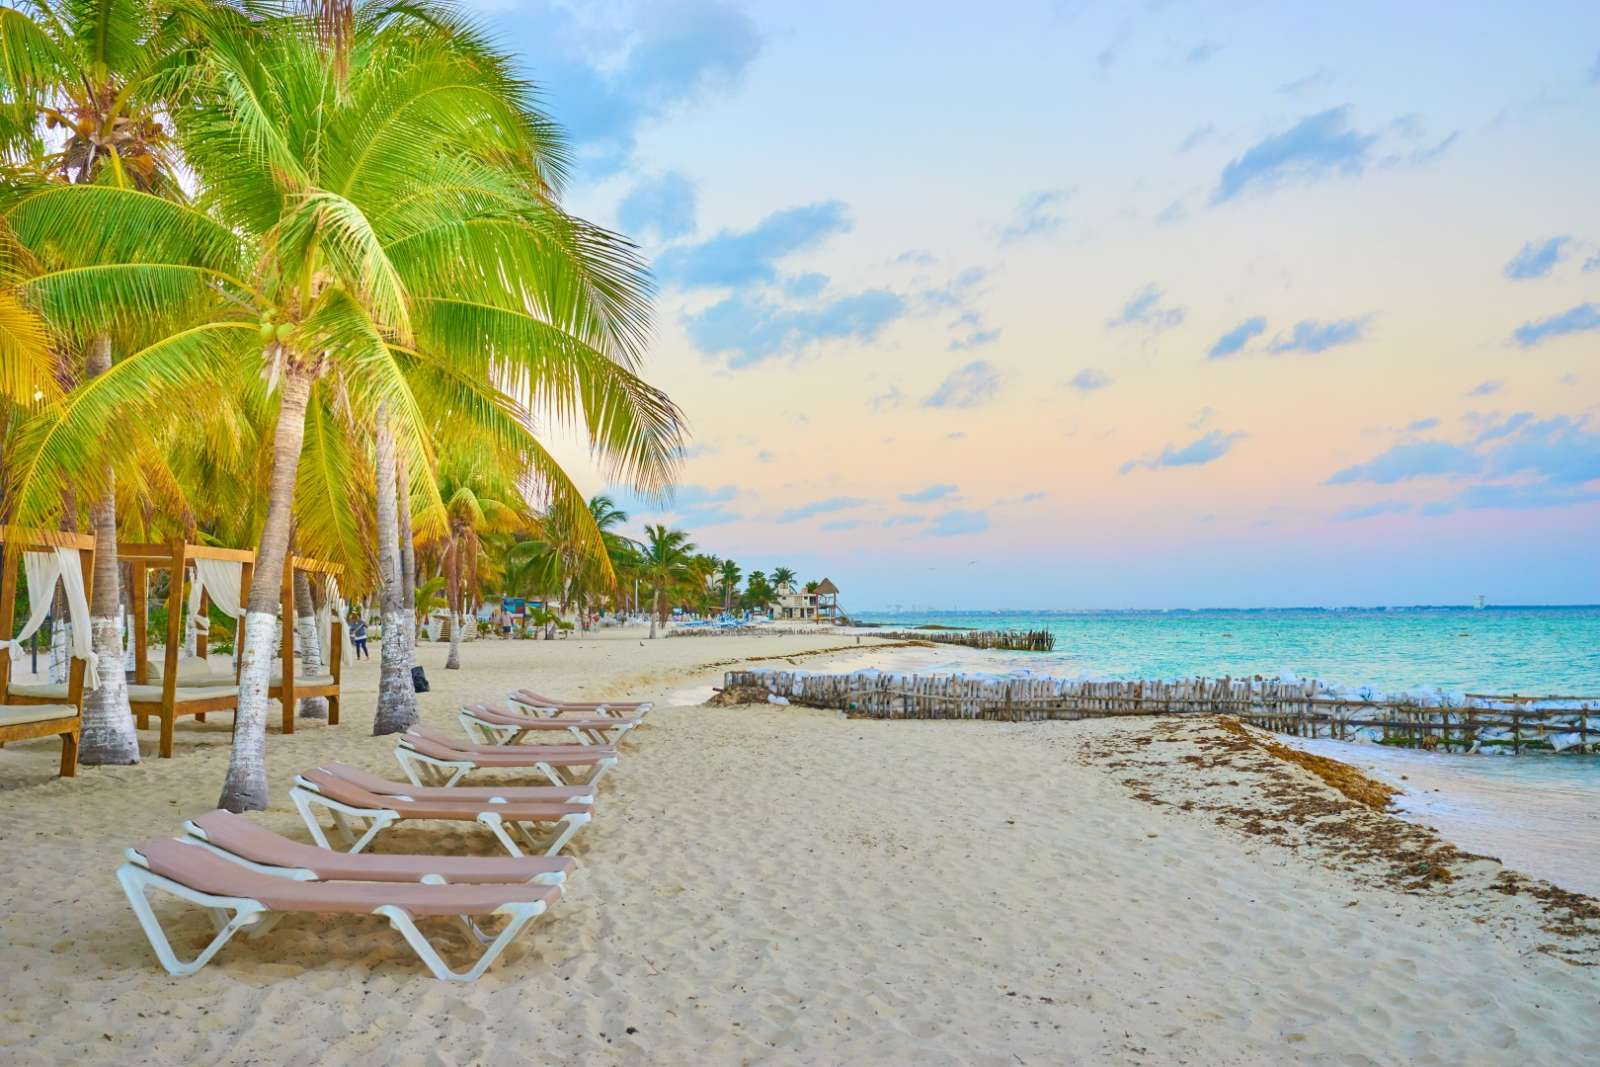 Beautiful beach on Isla Mujeres Mexico